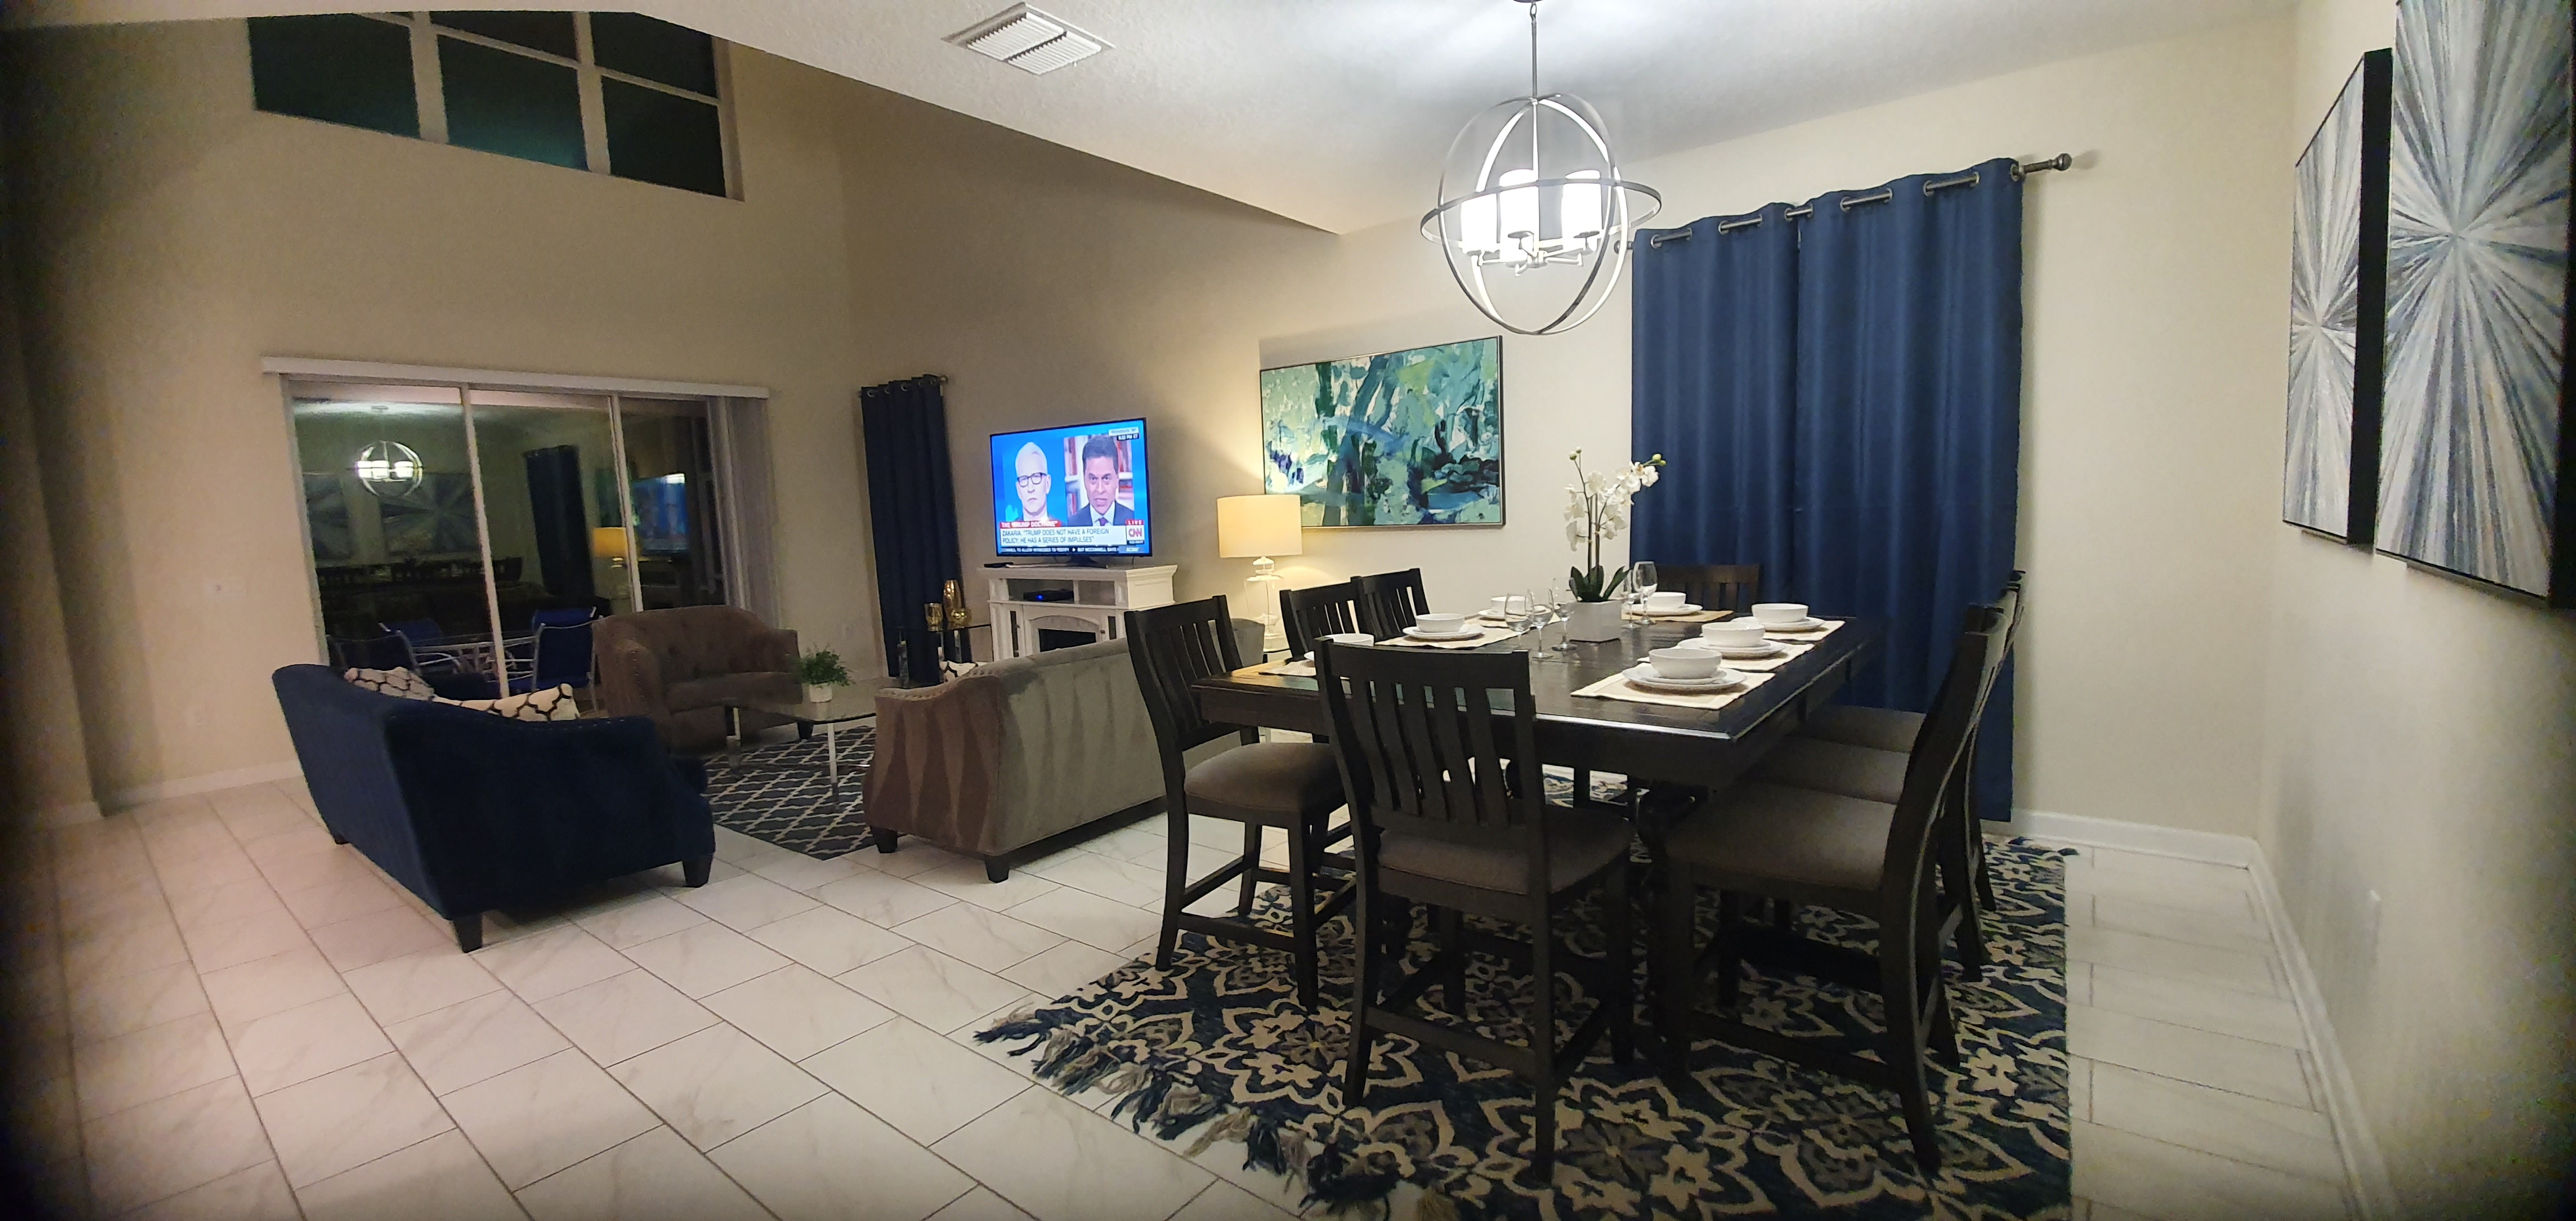 Apartment Villa  10 min from Disney  Golf  Wetpark all new photo 24719374